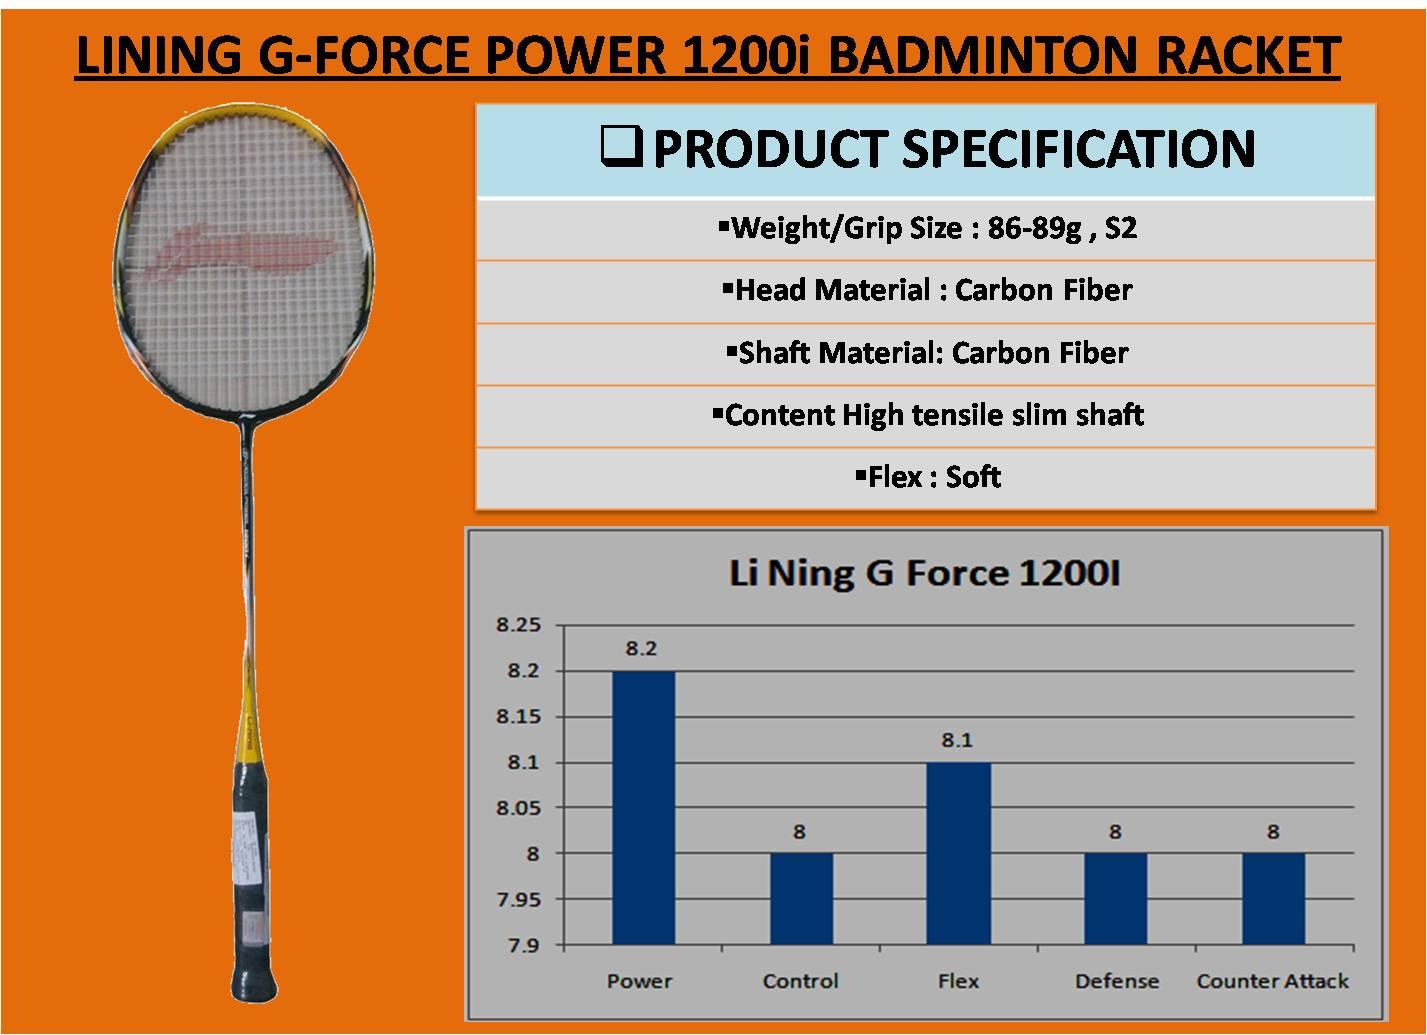 LINING G-FORCE POWER 1200i BADMINTON RACKET_5